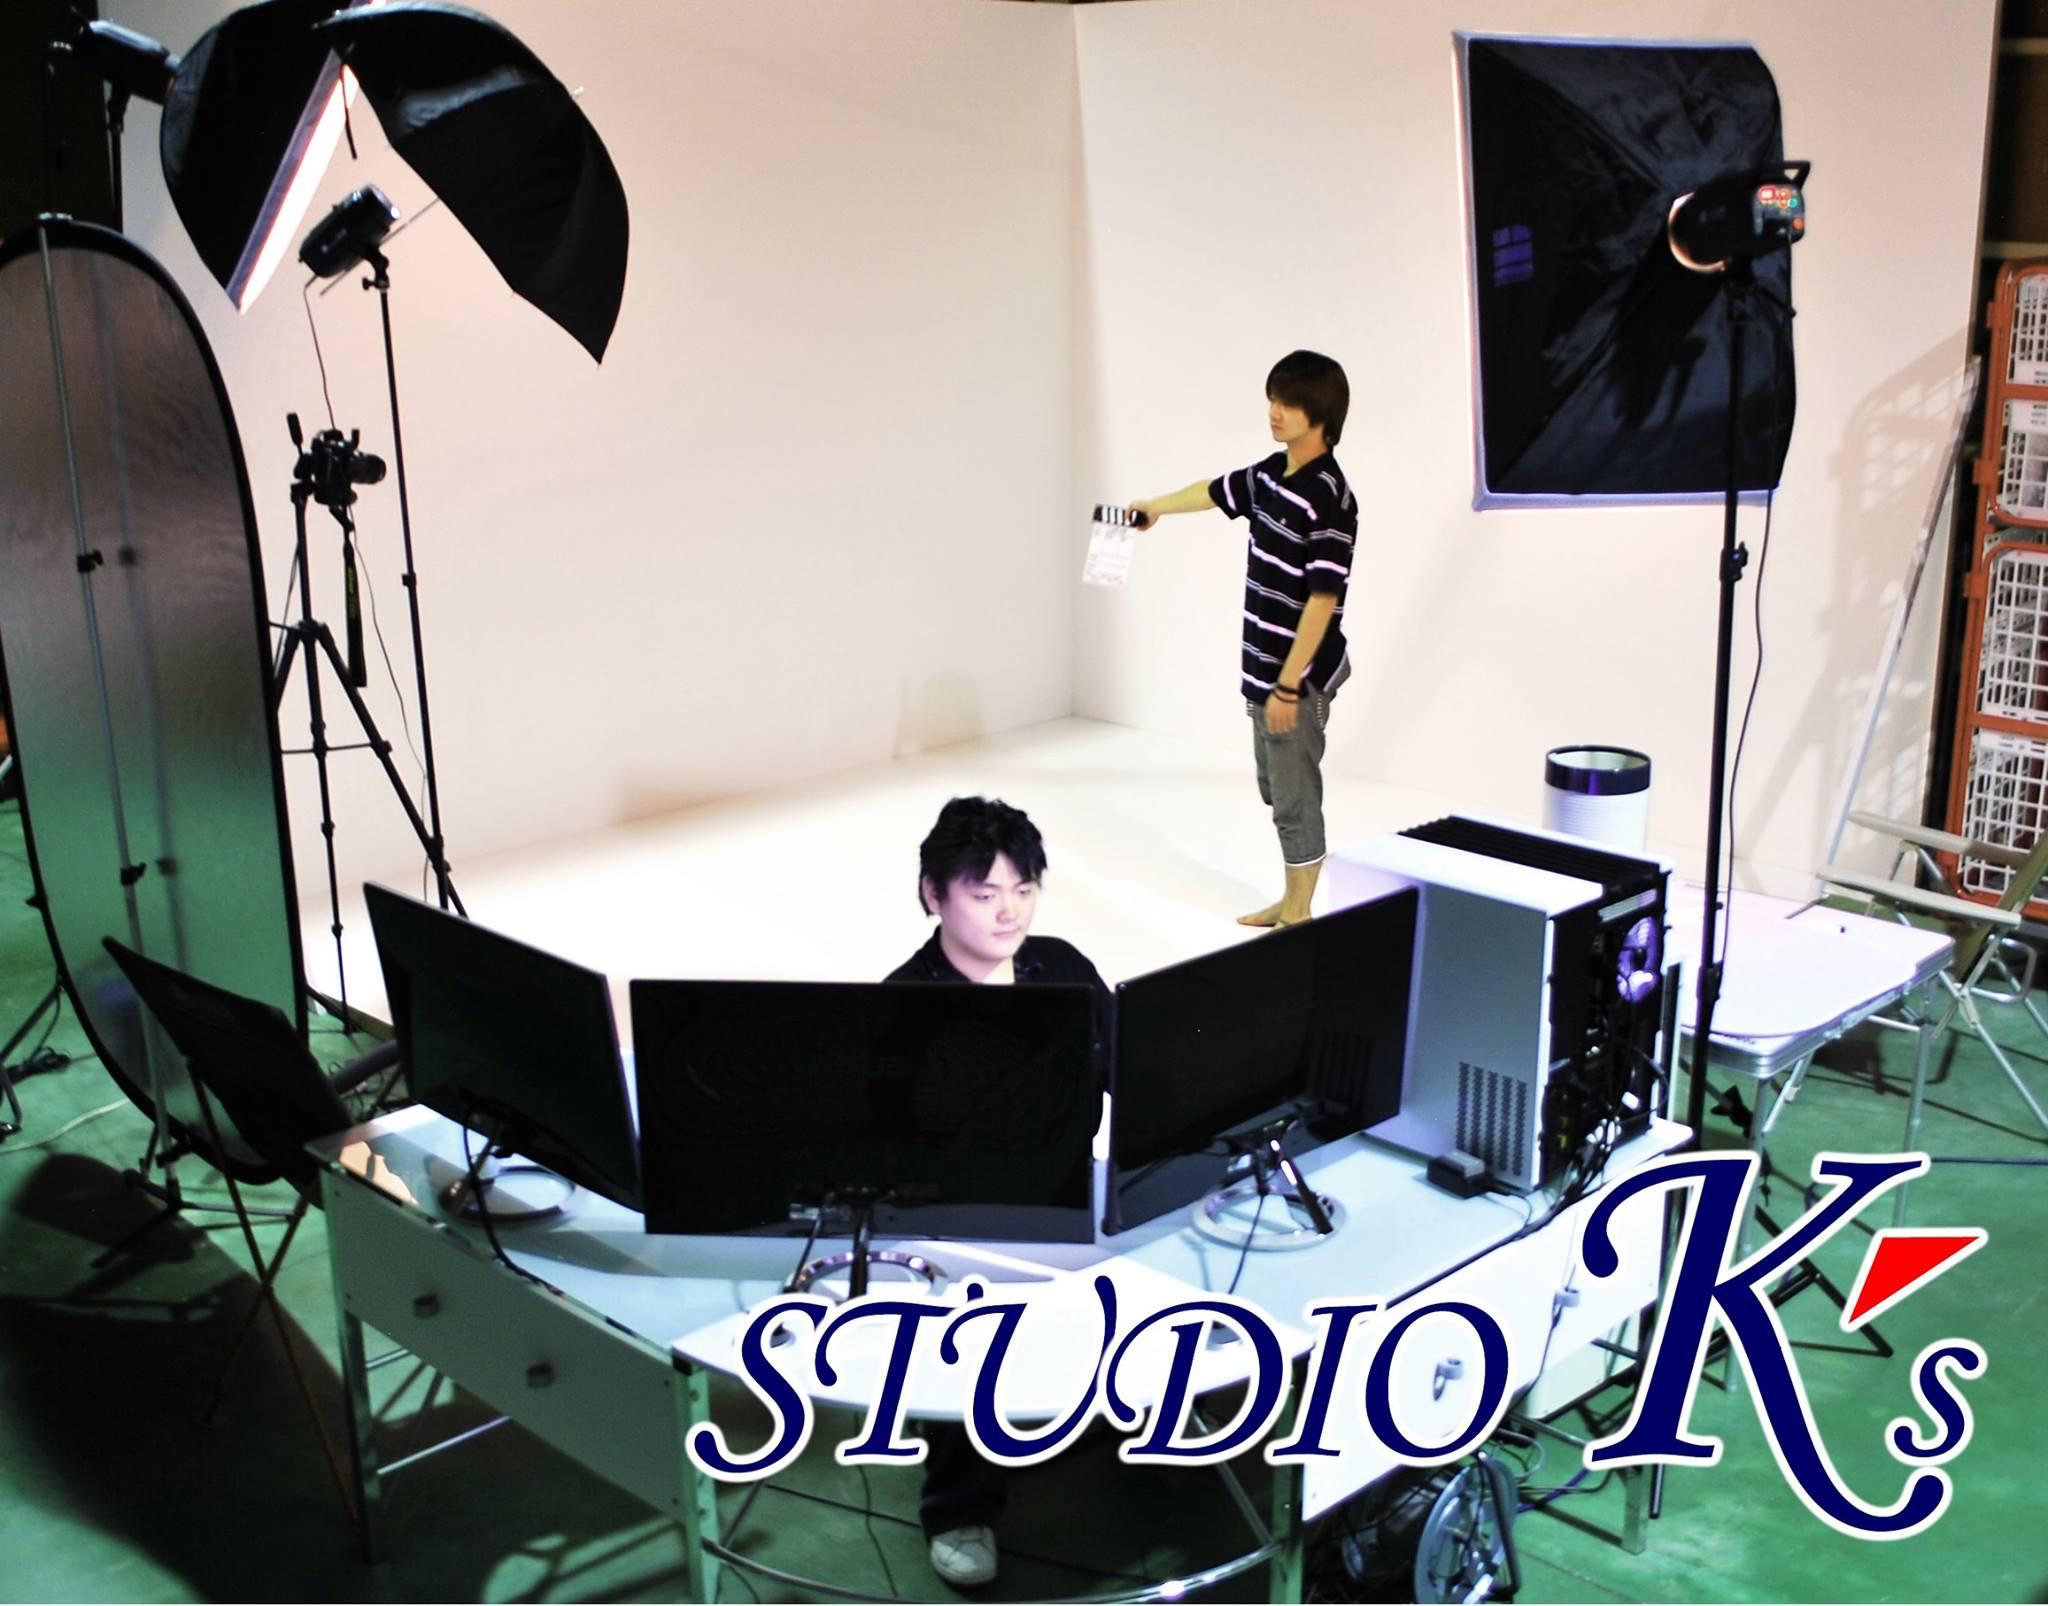 STUDIO-K's